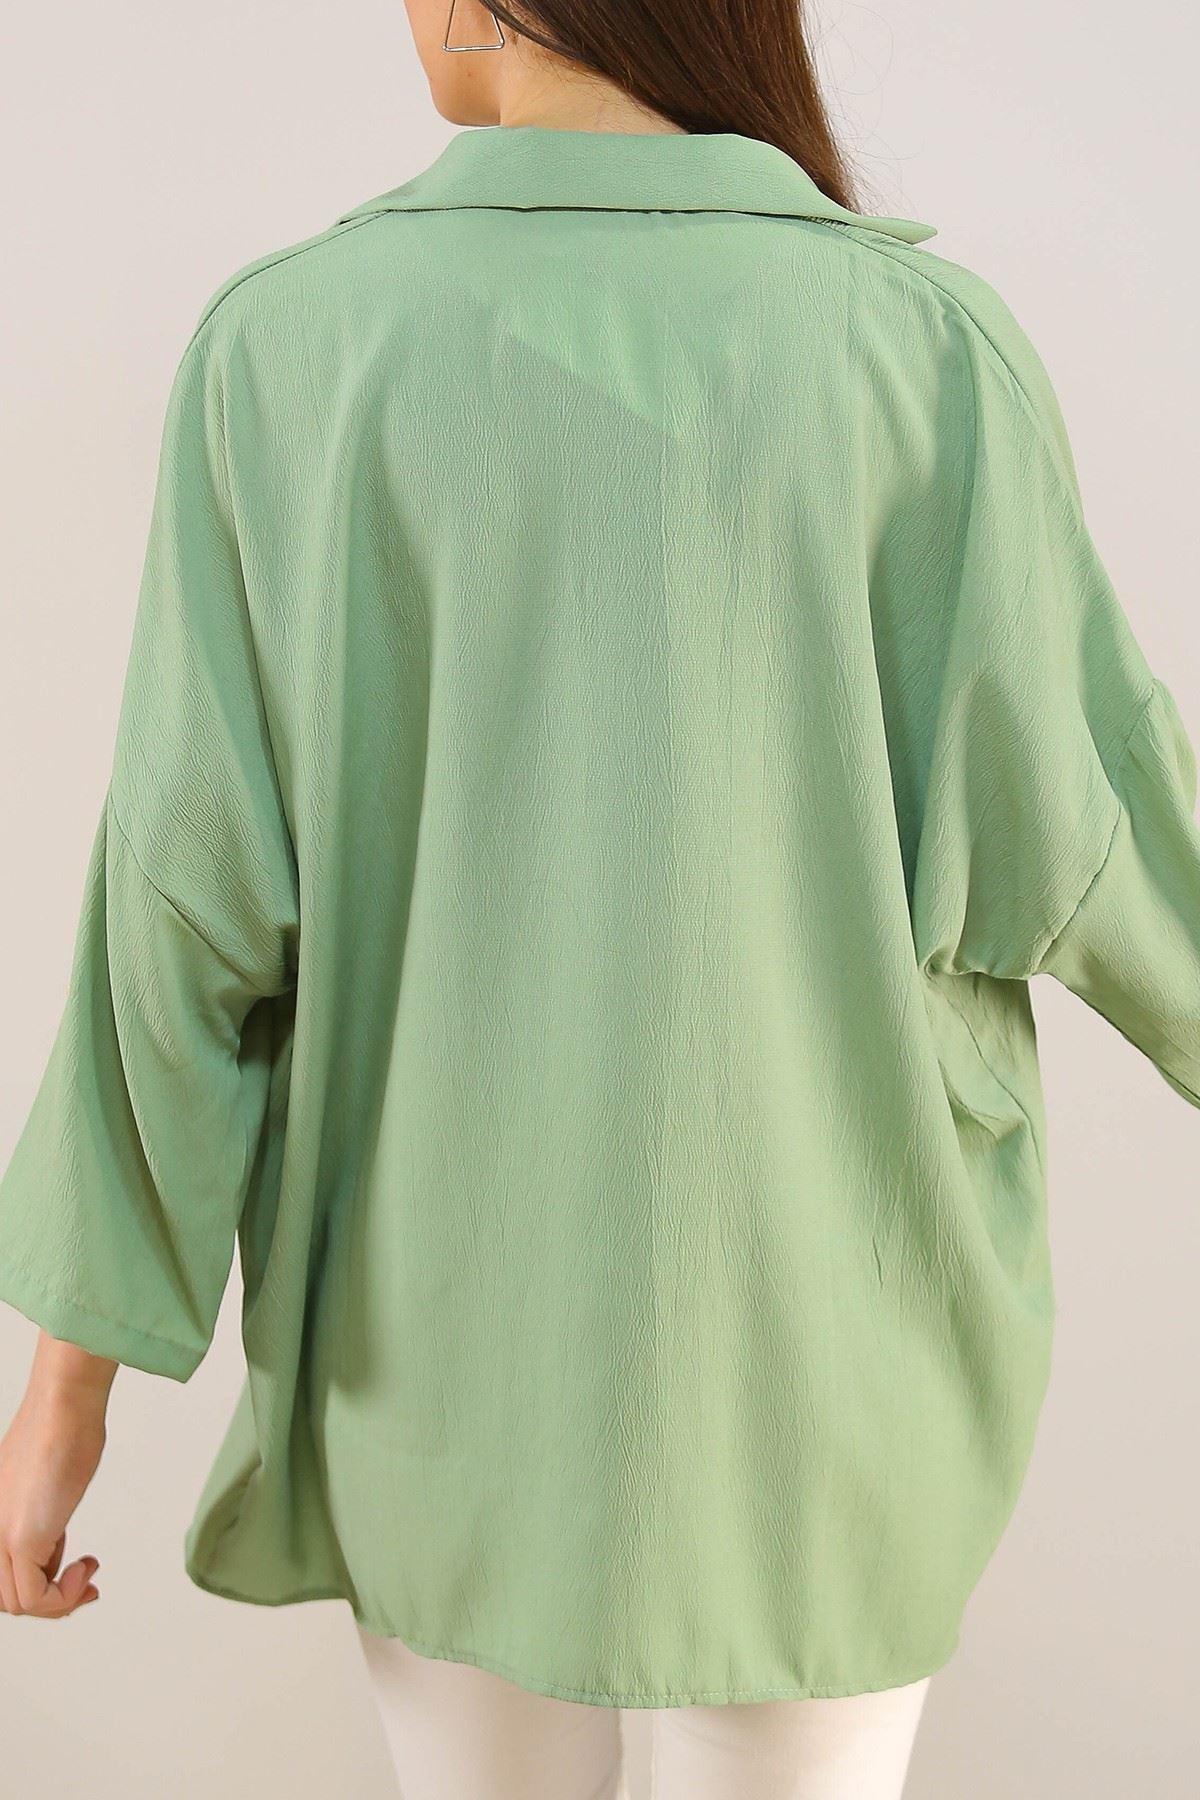 Salaş Gömlek Mint - 4806.701.